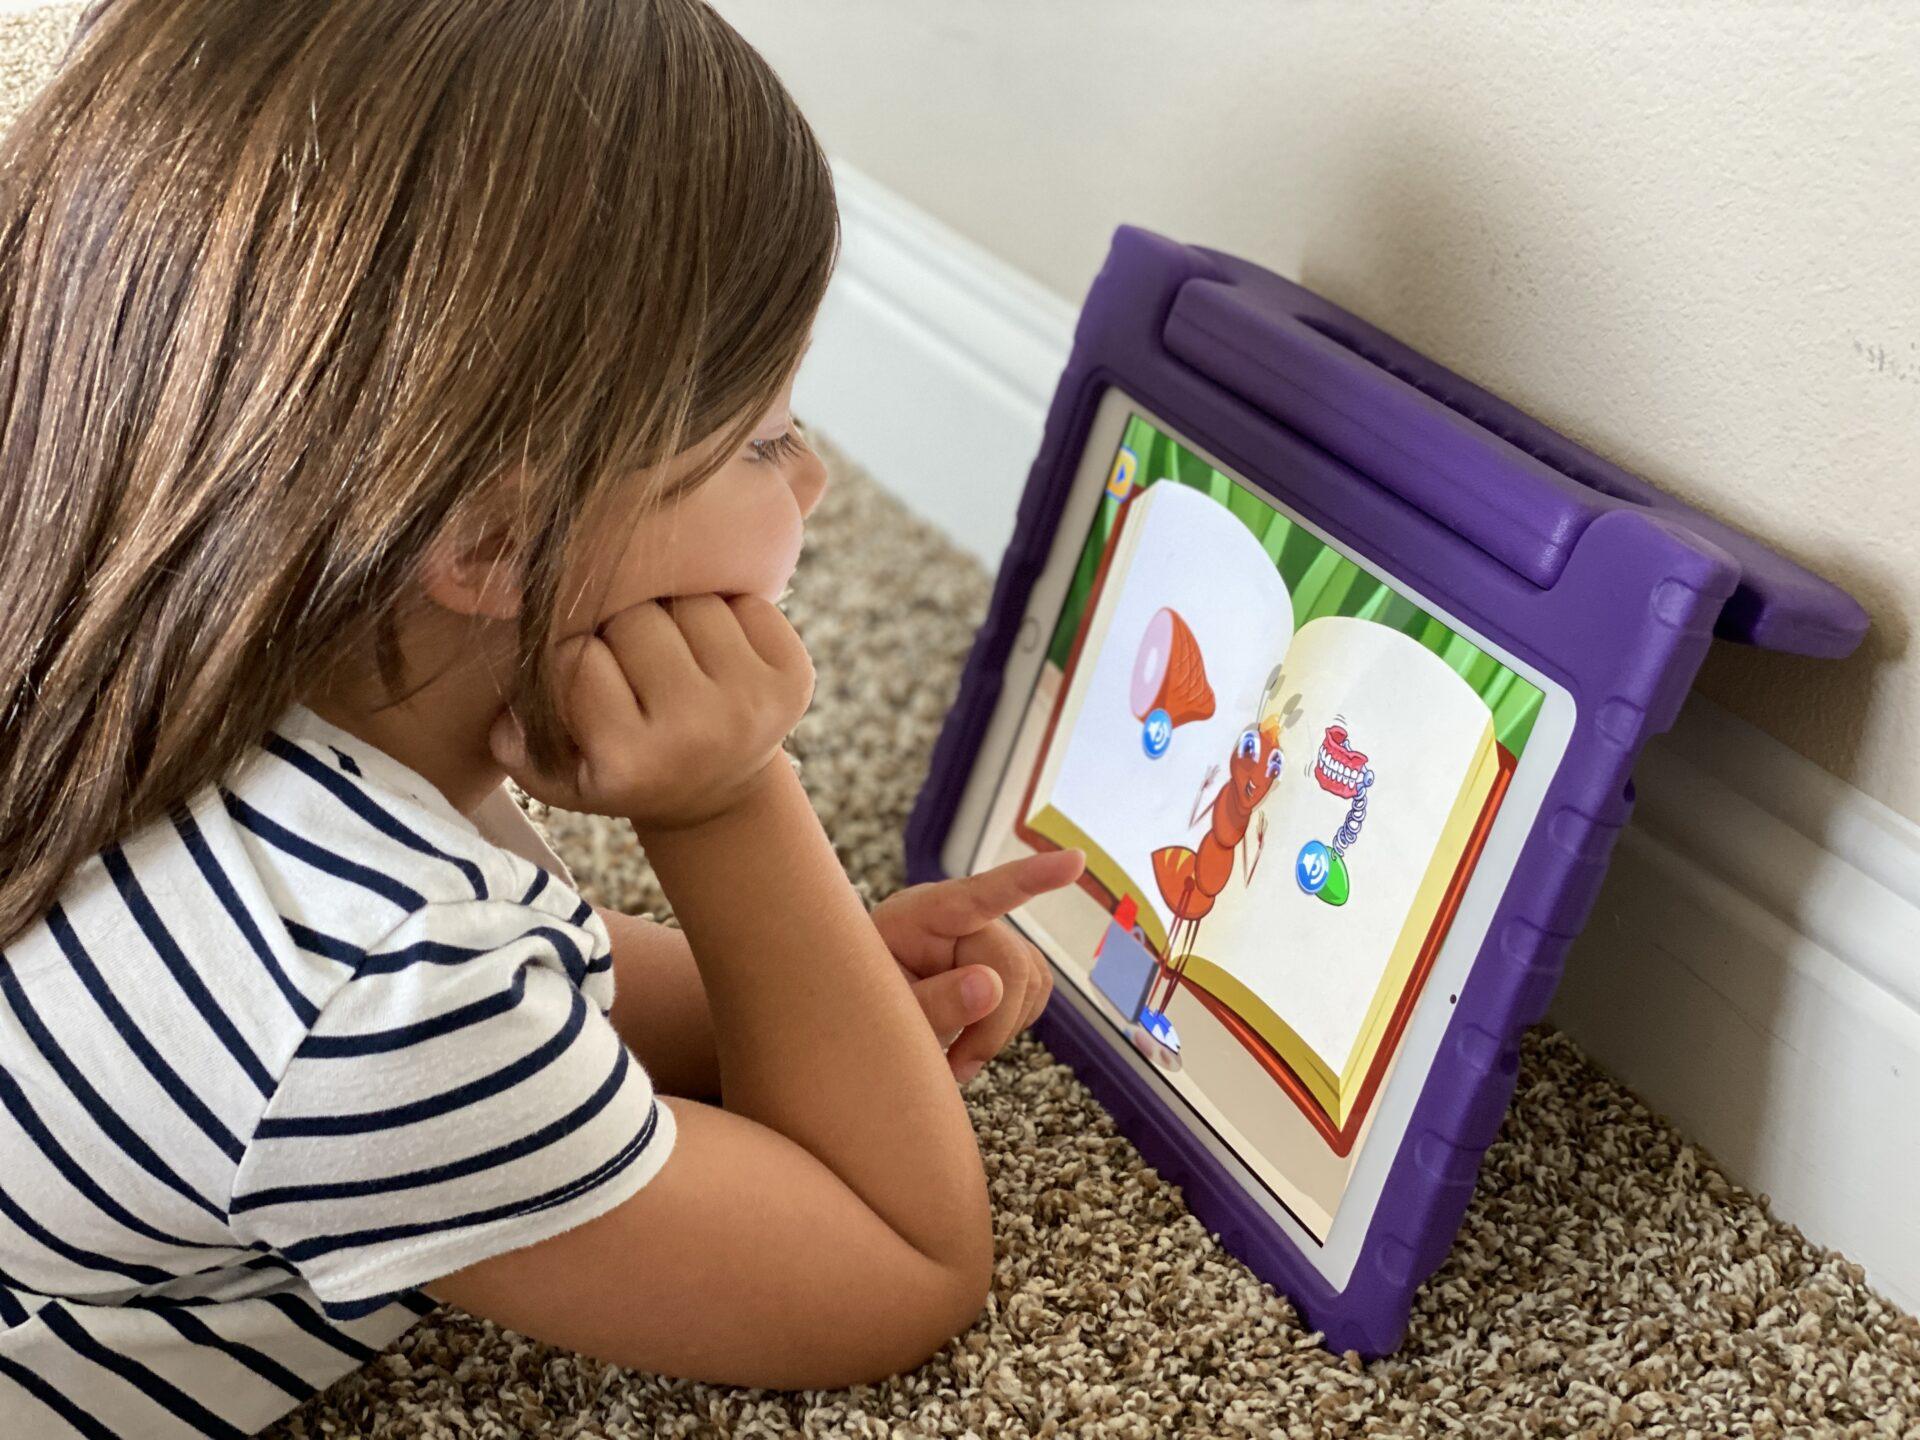 girl playing iPad on purple iPad